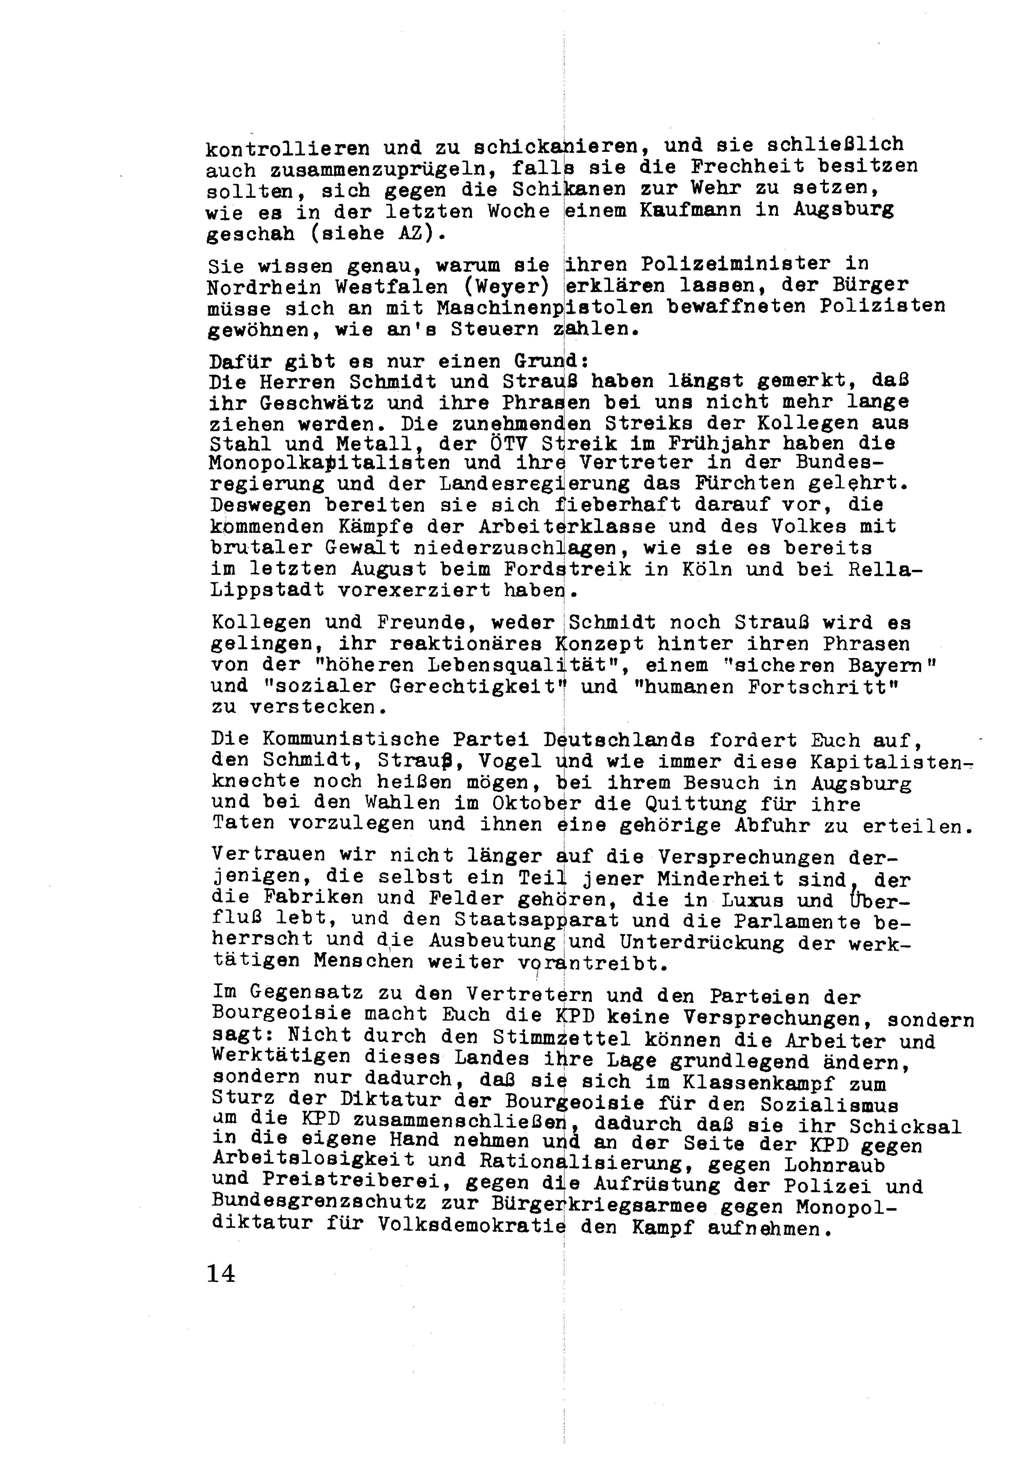 RHeV_Anschuldigung_RA_Gildemeier_Seite_14